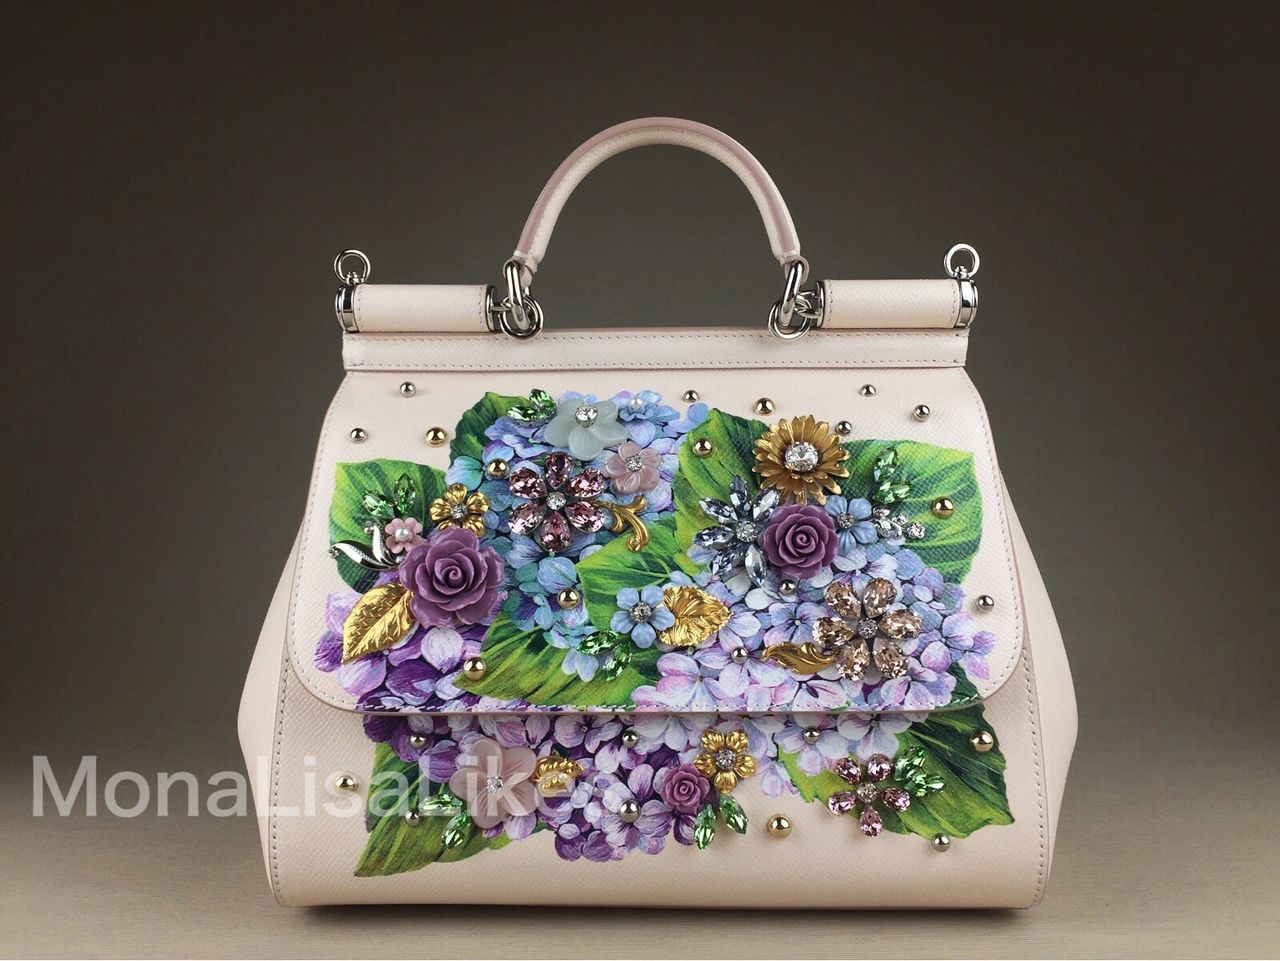 DOLCE & GABBANA Miss Sicily Hydrangea Embellished bag